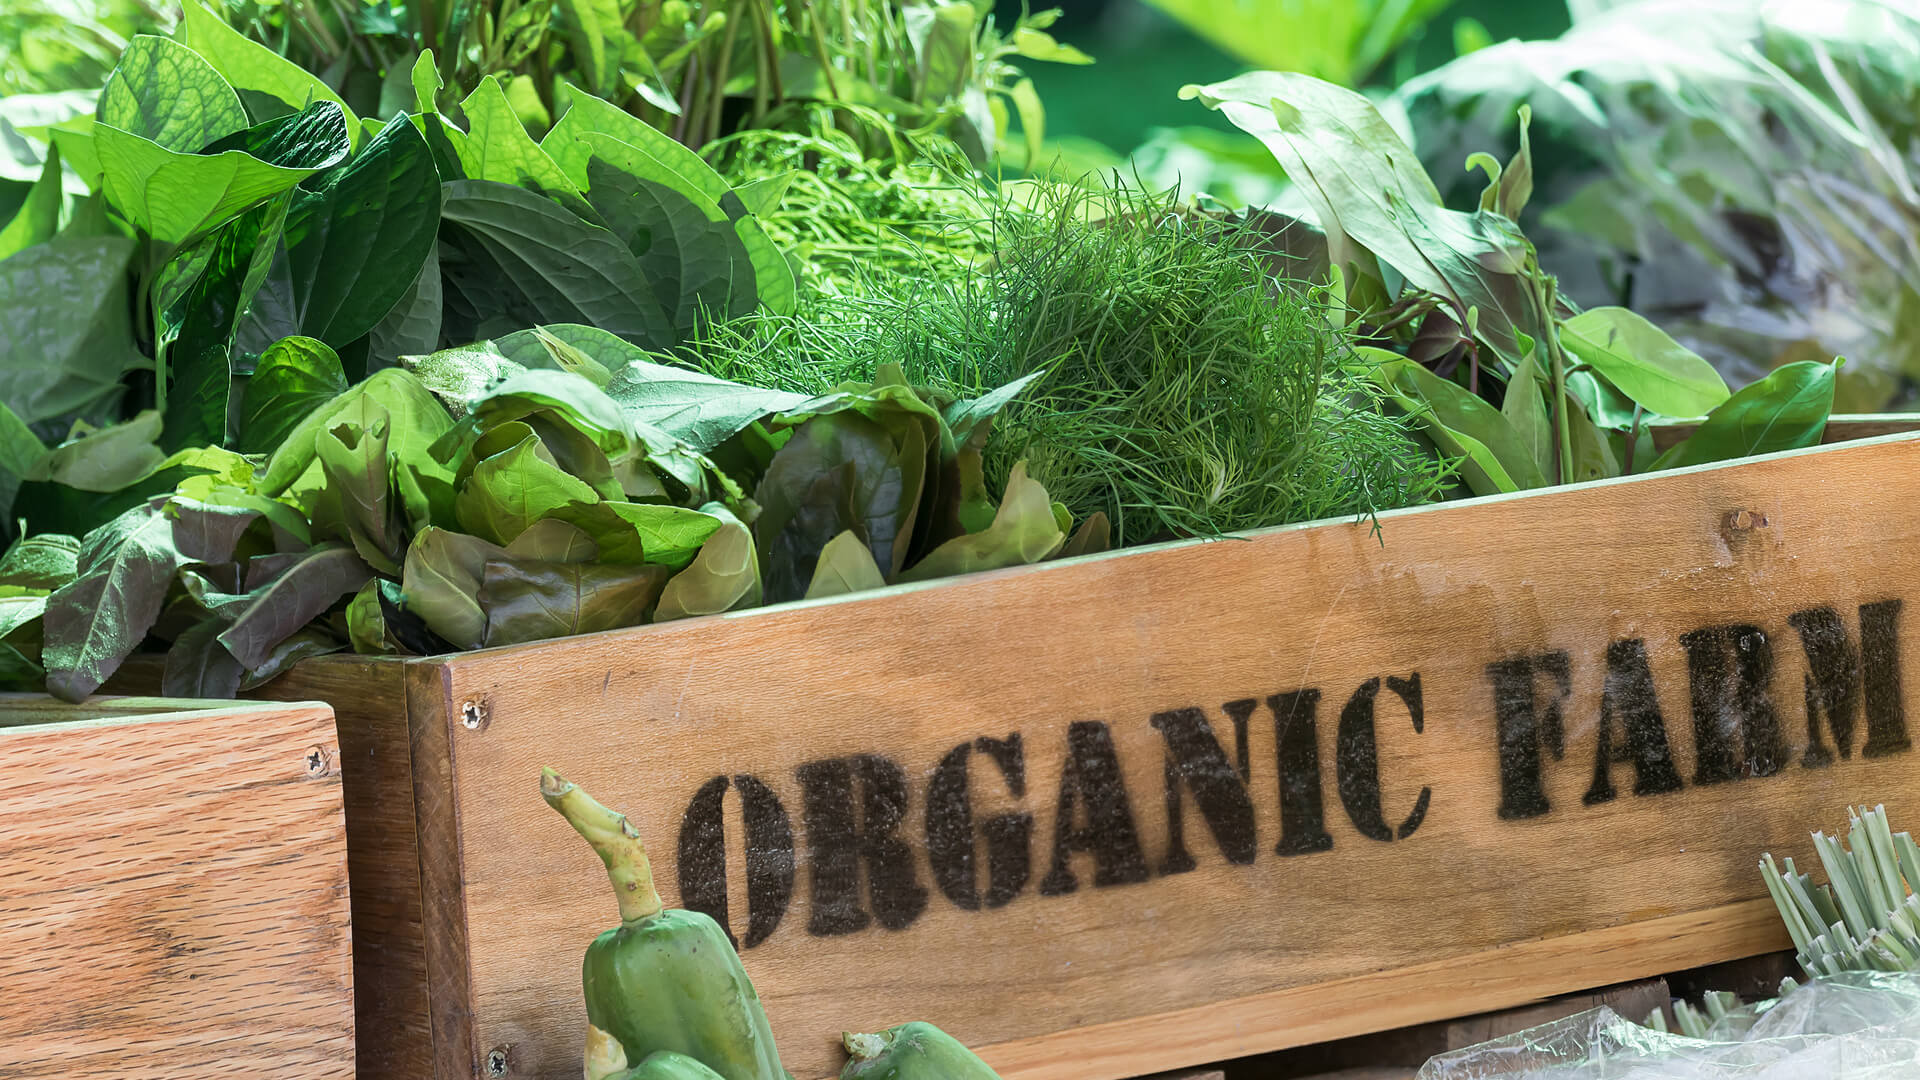 ss-organic-produce-farm